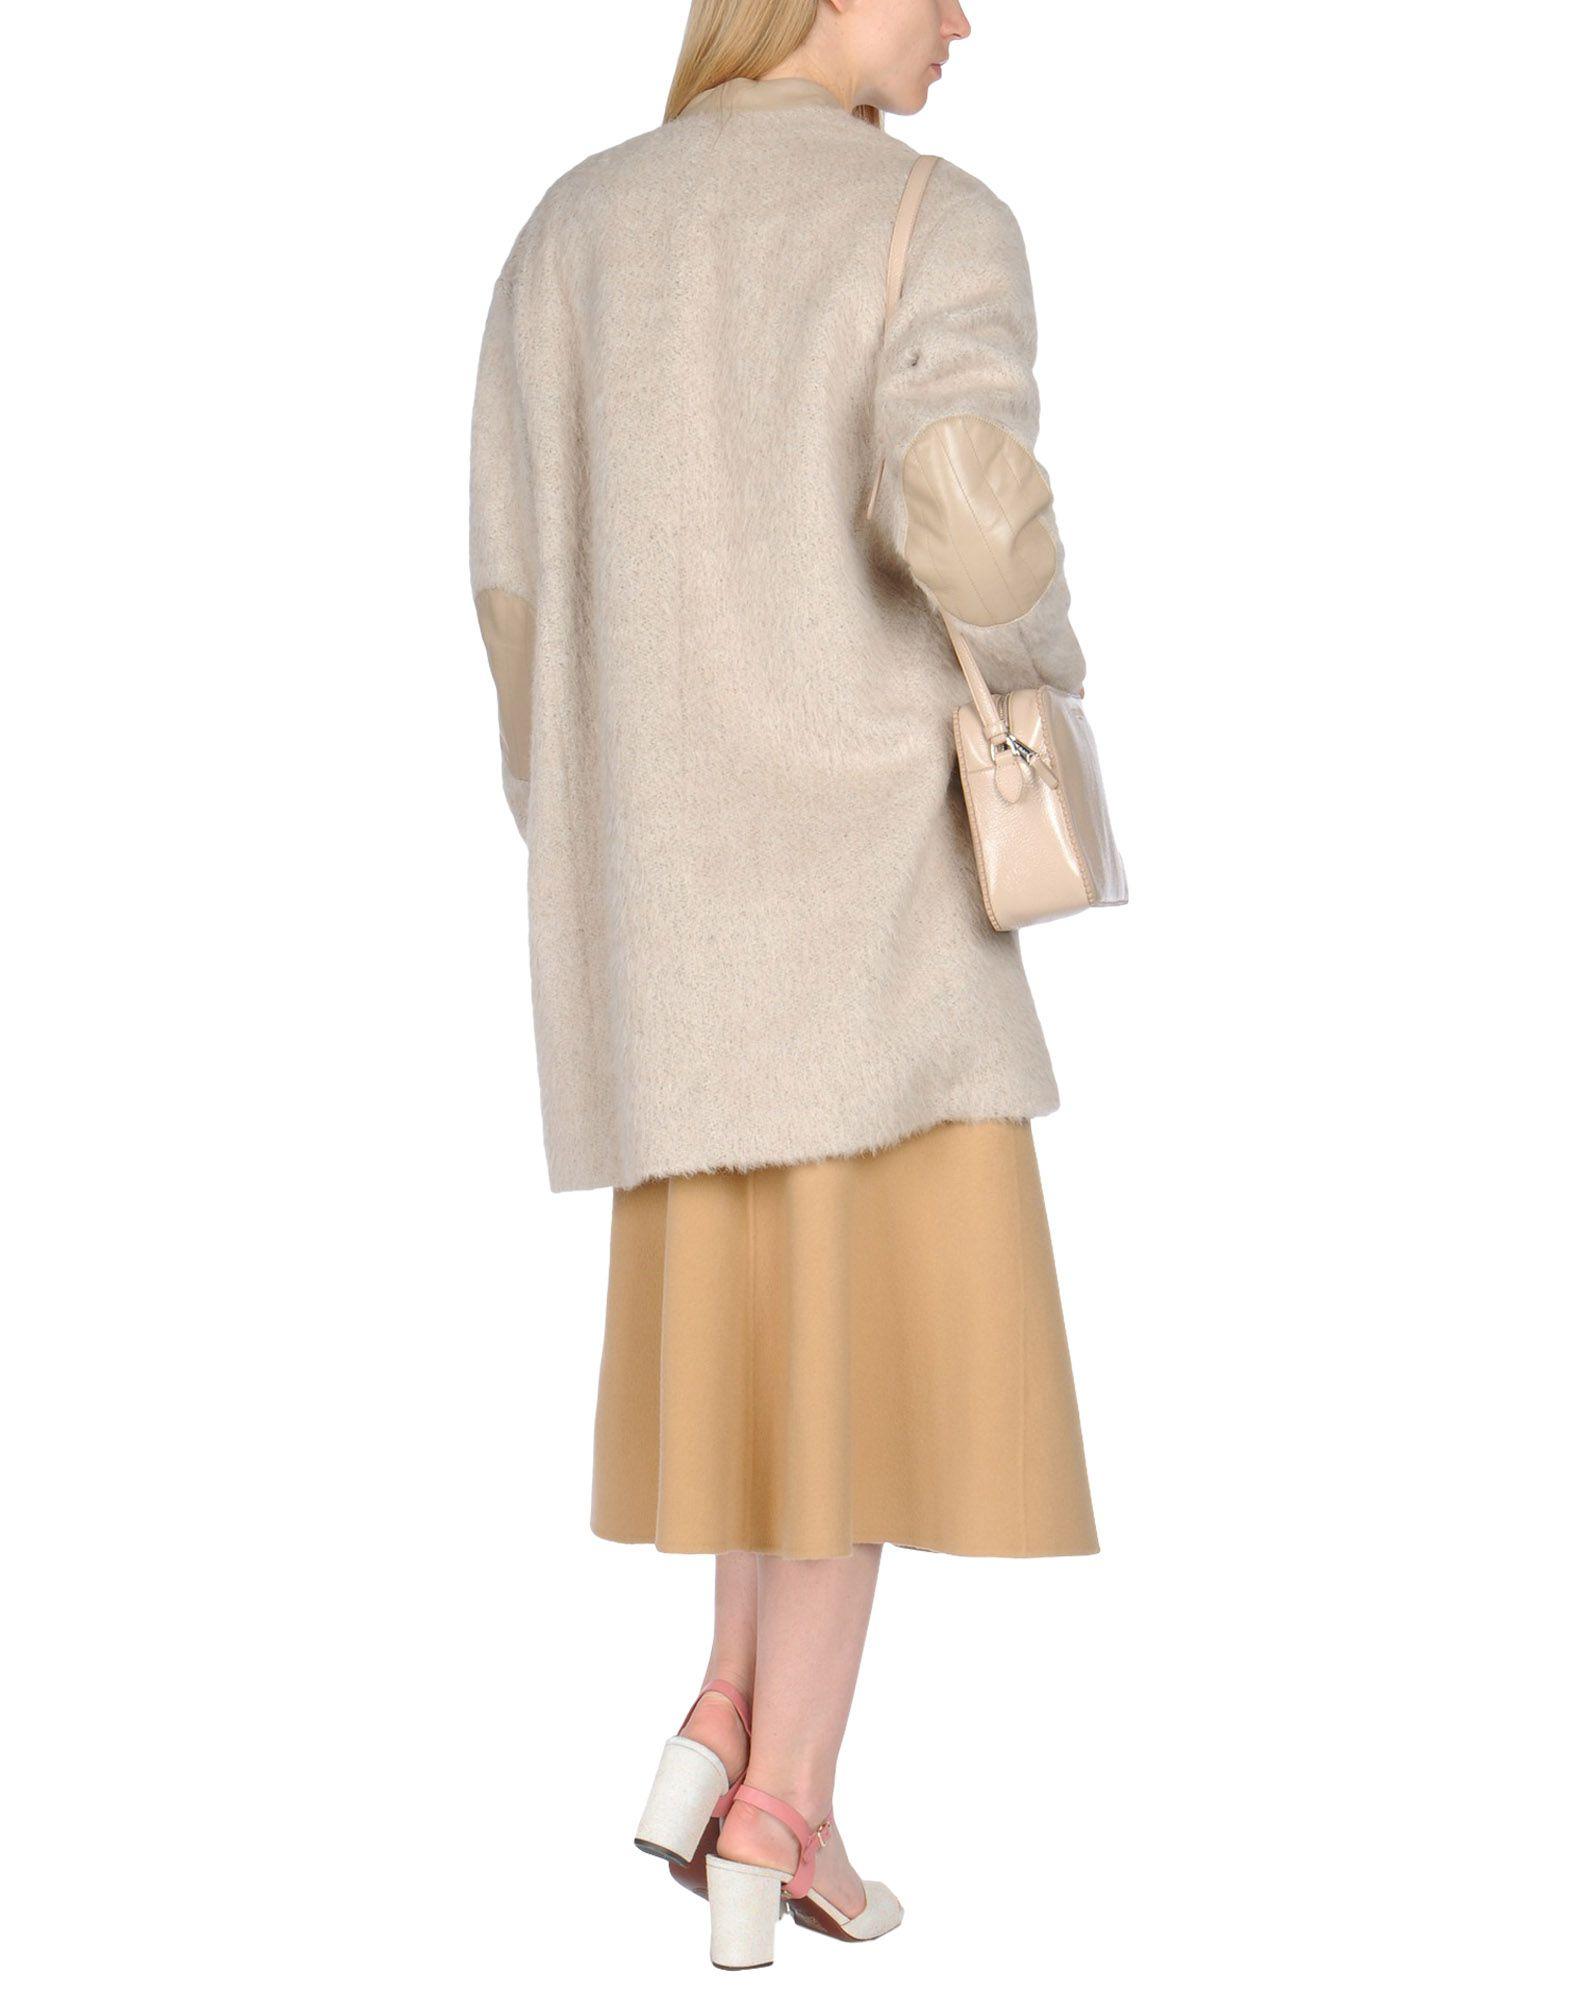 Tibi coats 4